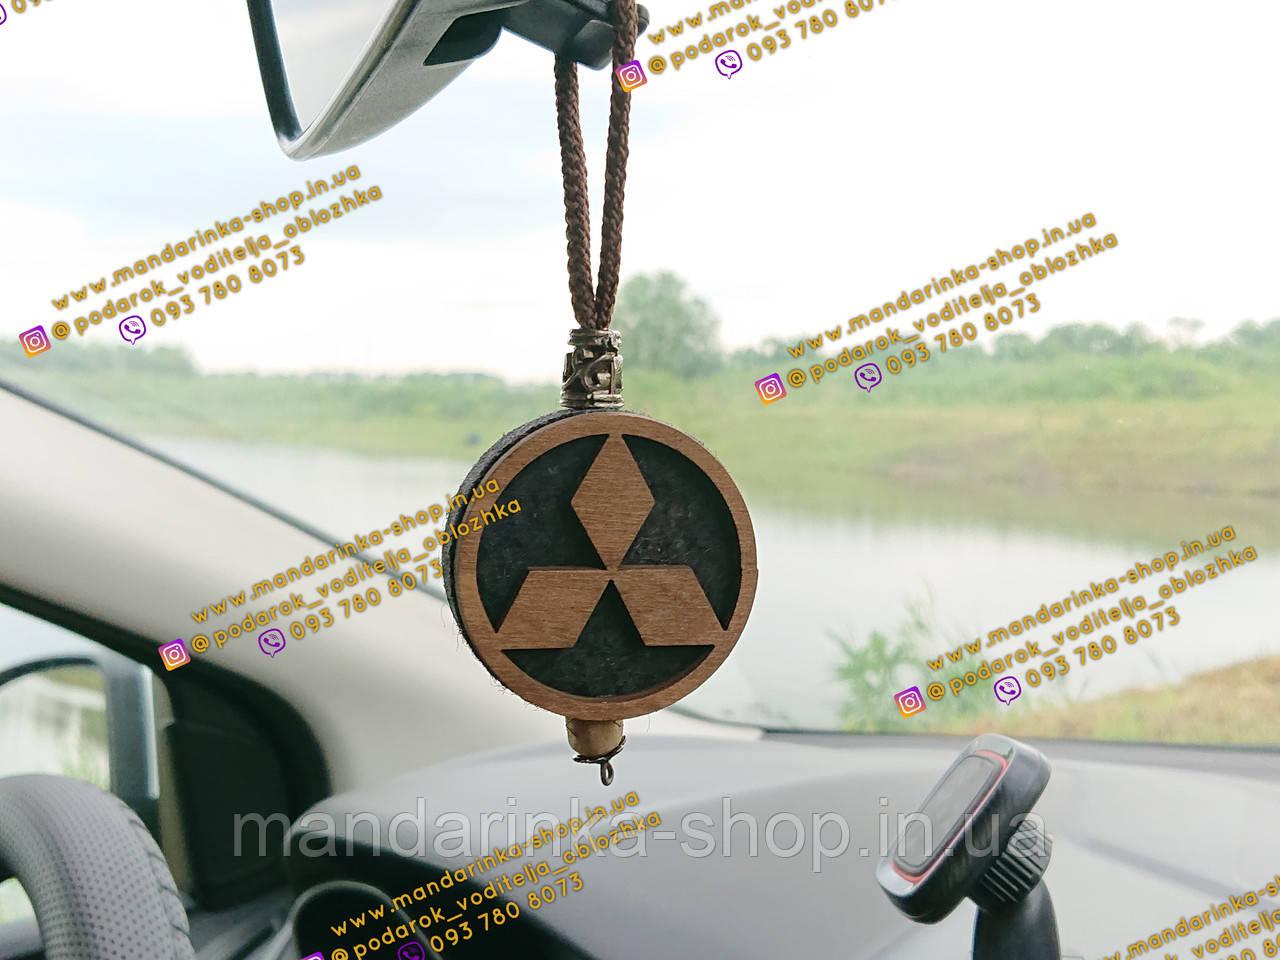 Подвеска ароматизатор Mitsubishi, Парфюм Митсубиши на зеркало